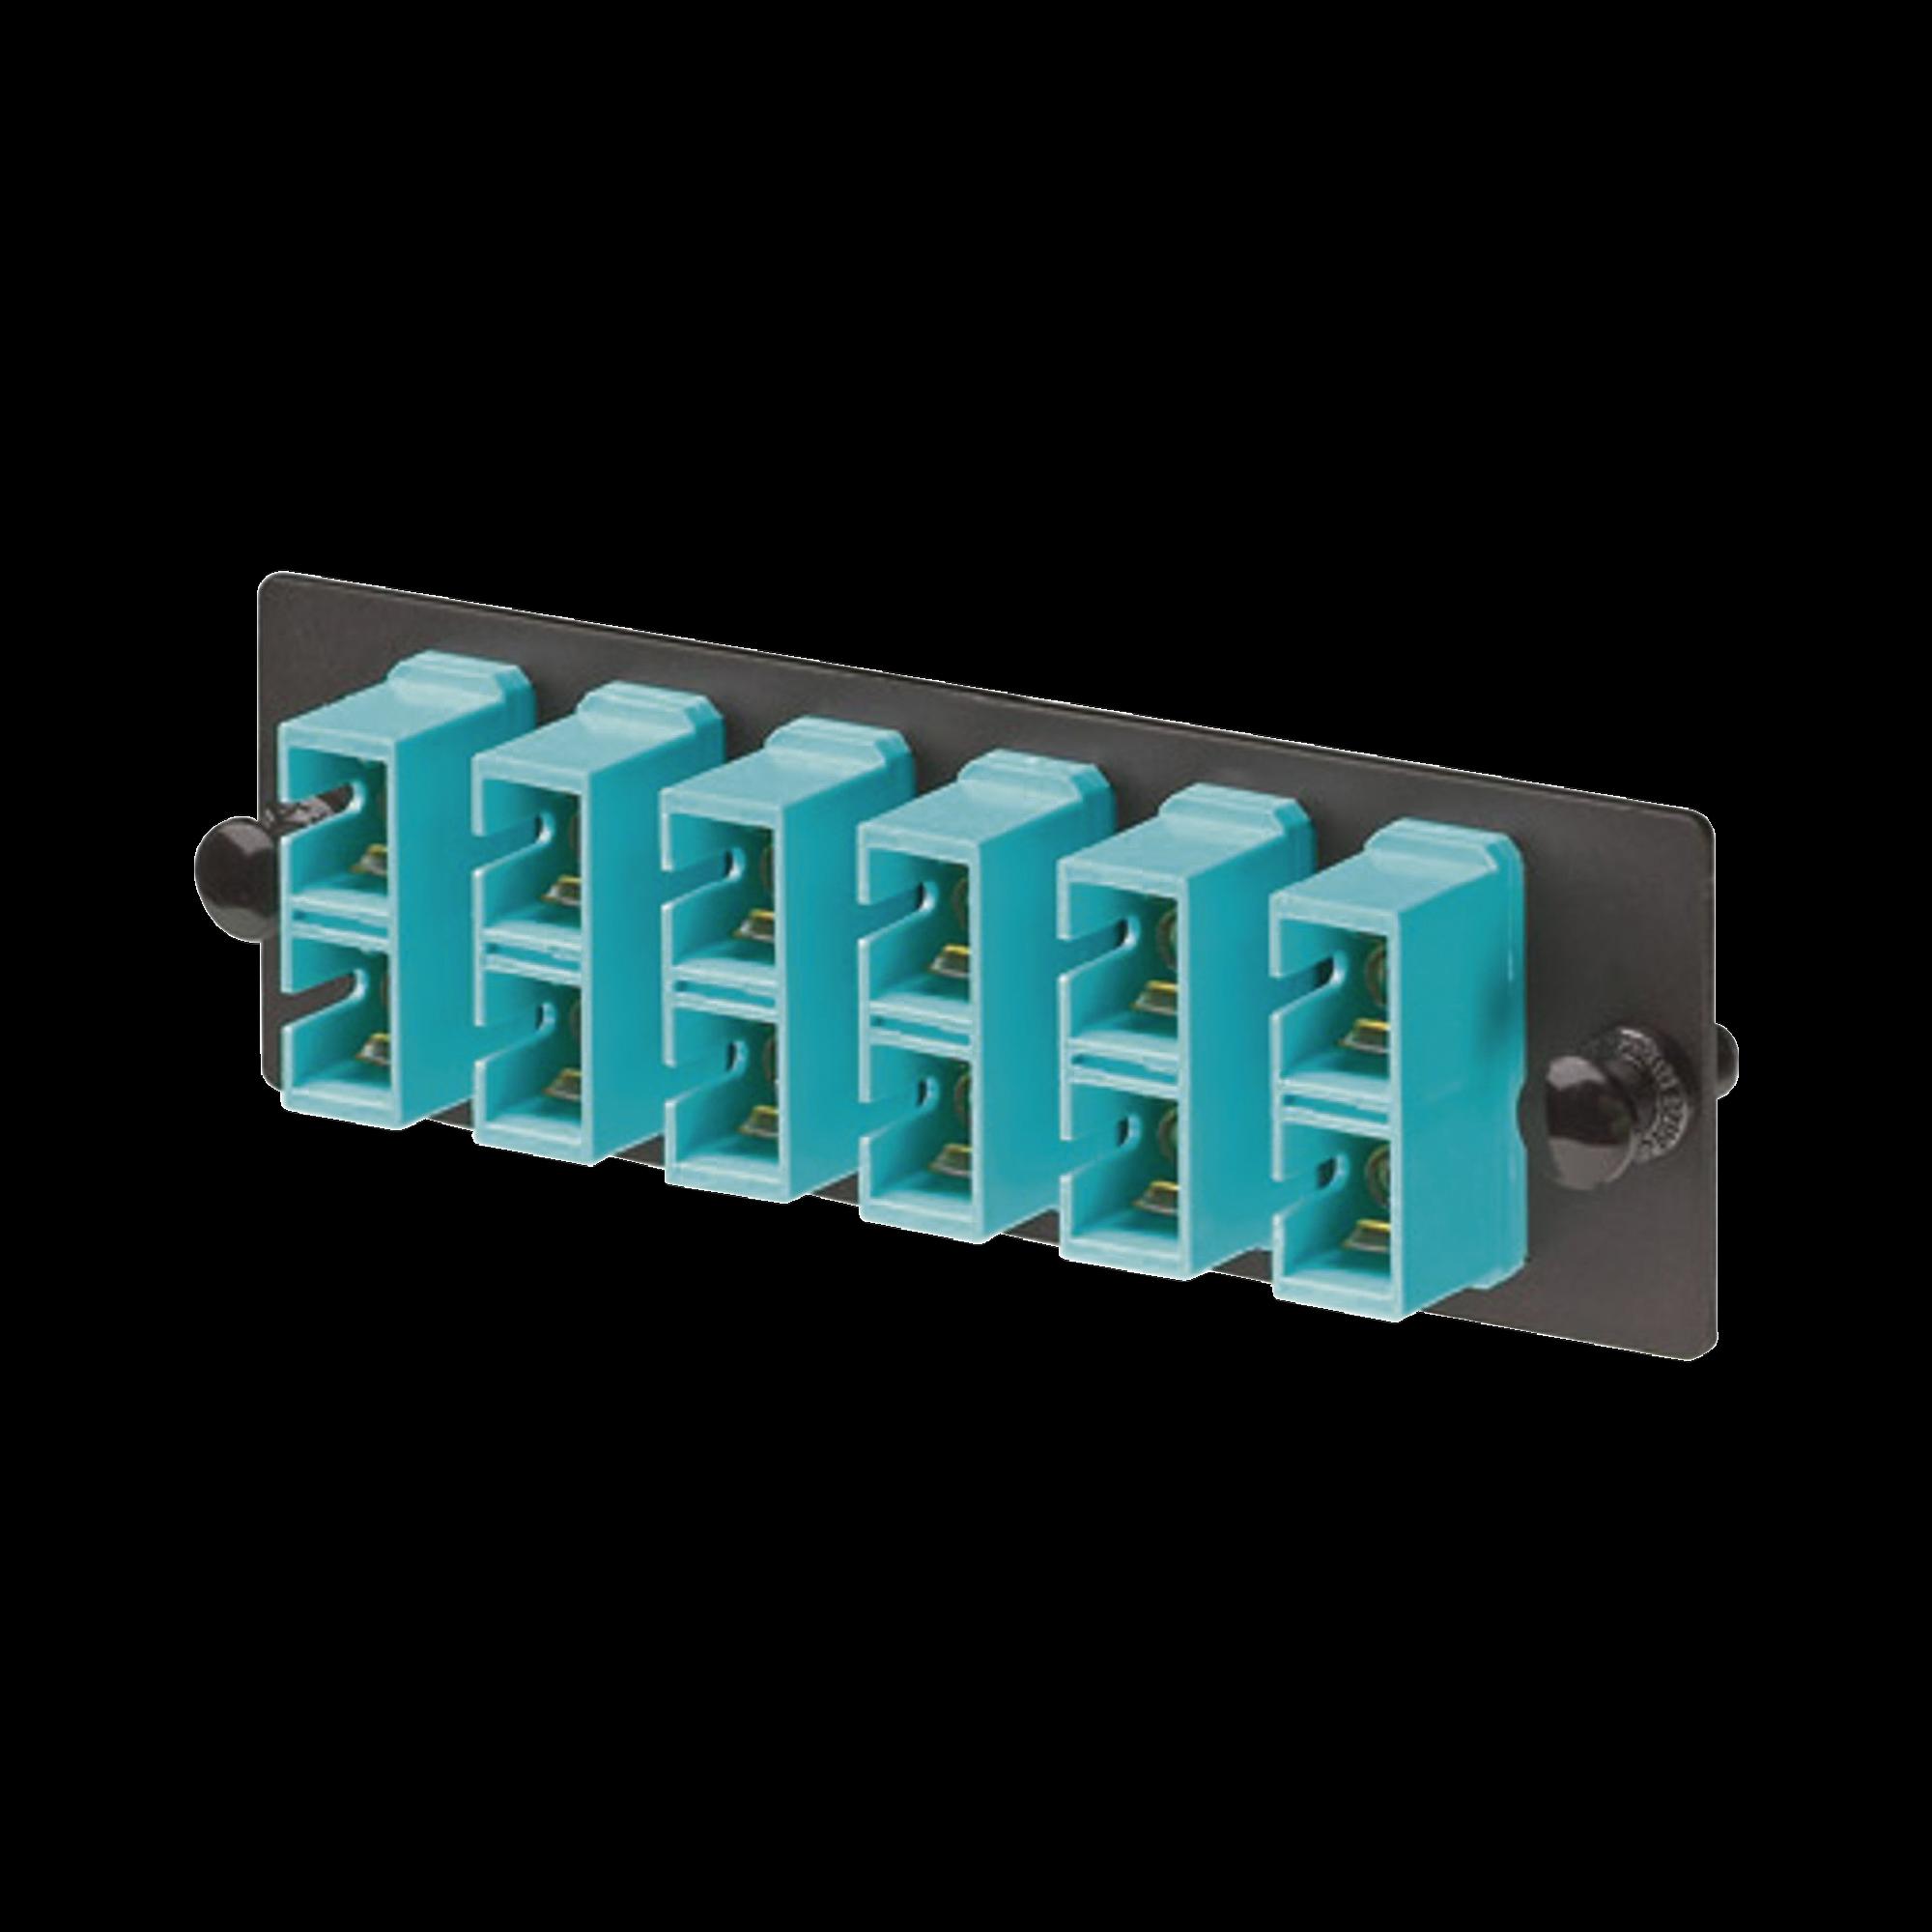 Placa Acopladora de Fibra Optica FAP, Con 6 Conectores SC Duplex (12 Fibras), Para Fibra Multimodo OM3/OM4, Color Aqua